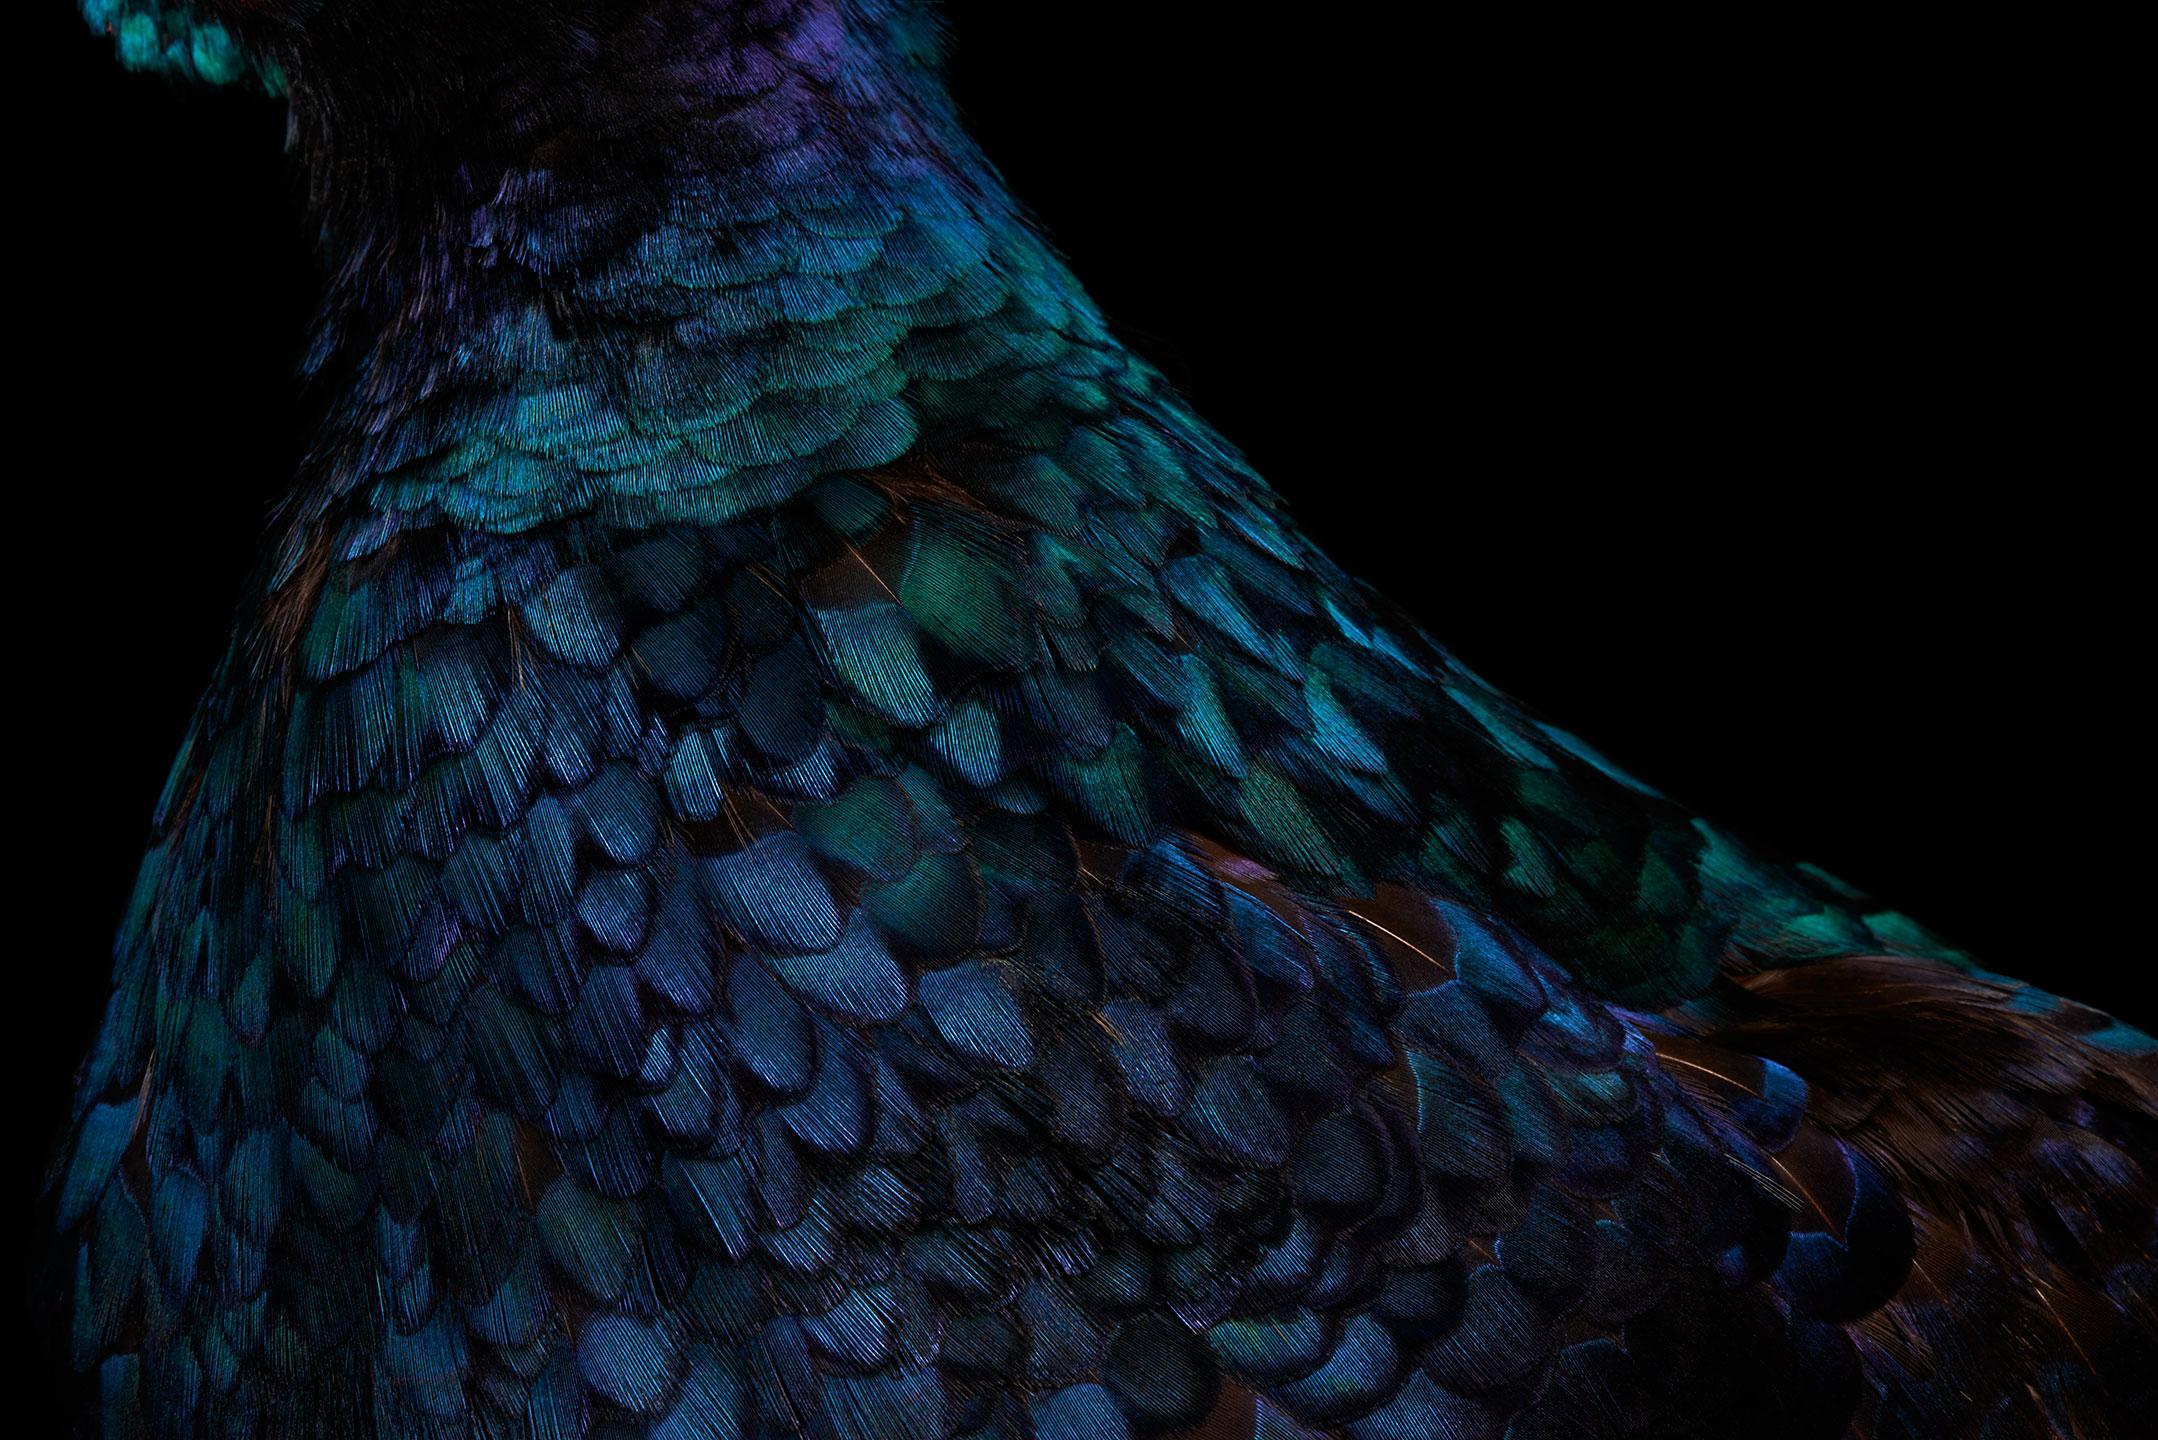 "<a href=""//mrsteel.london/shop/melanistic-pheasant-iv/"">REVEAL DETAILS / BUY</a>"